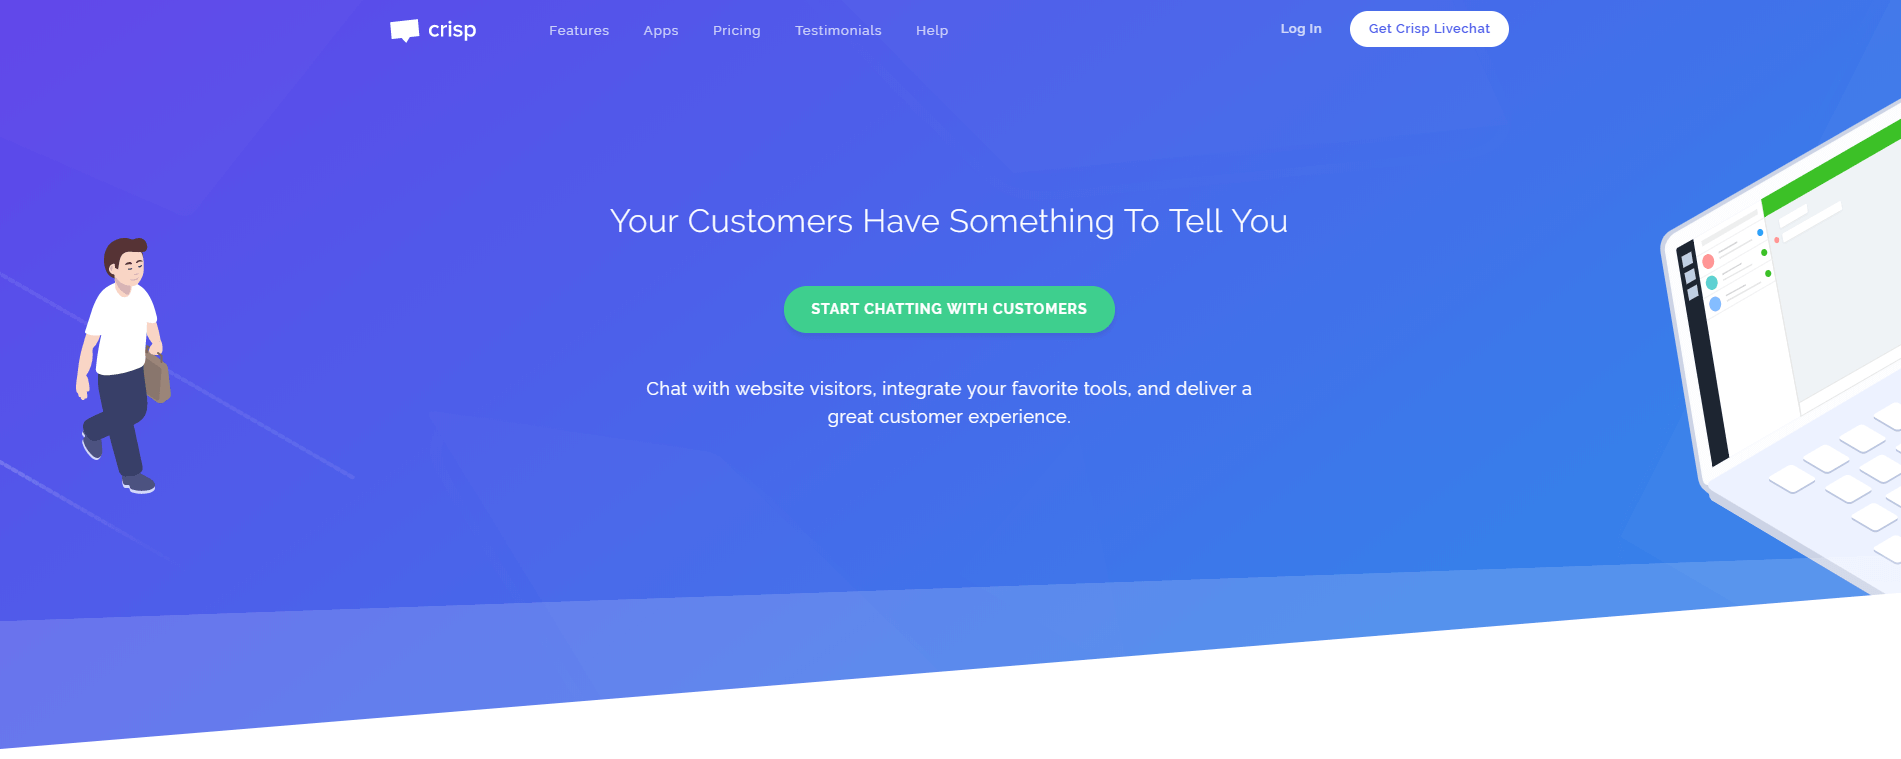 Обзор онлайн-консультантов на сайт - Crisp